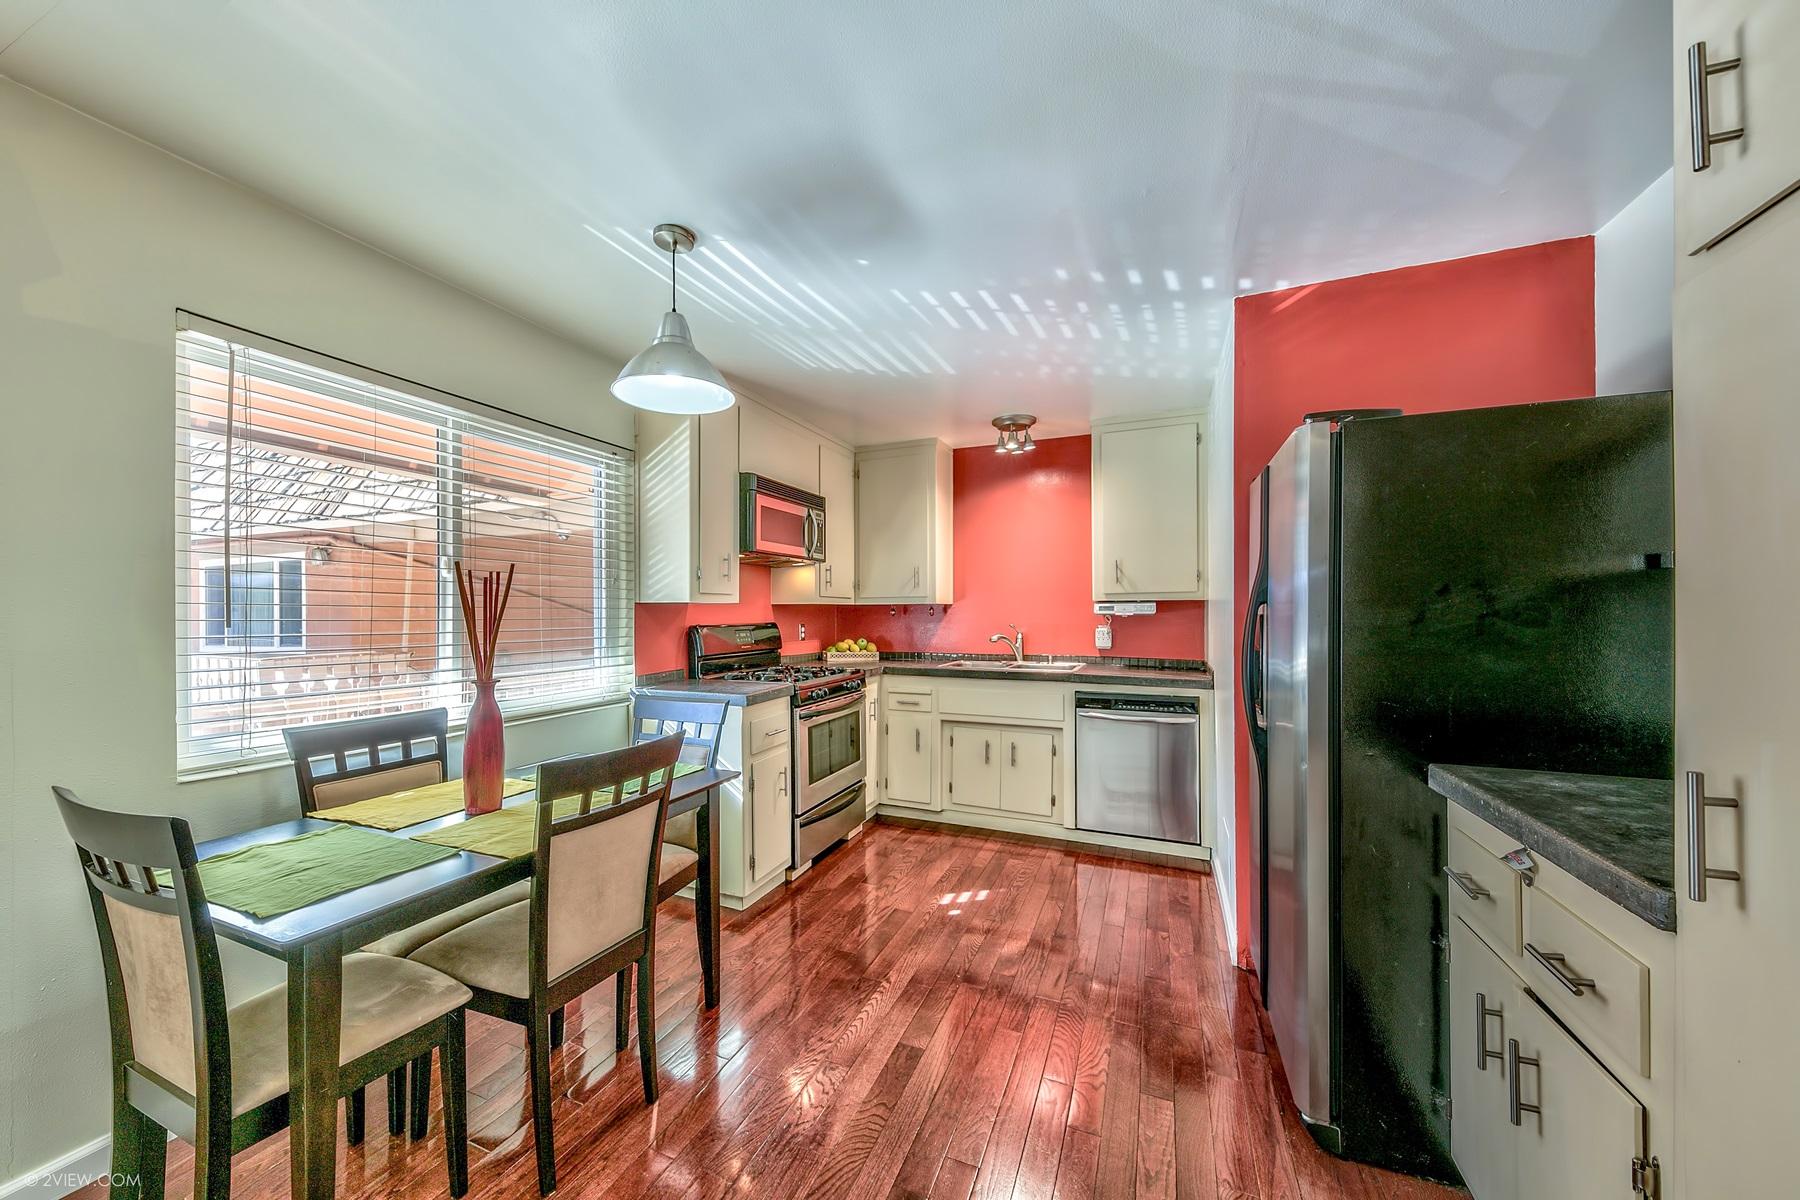 Condominium for Active at 1223 Bonanza Ave. #21, South Lake Tahoe, CA 96150 1223 Bonanza Ave. #21 South Lake Tahoe, California 96150 United States